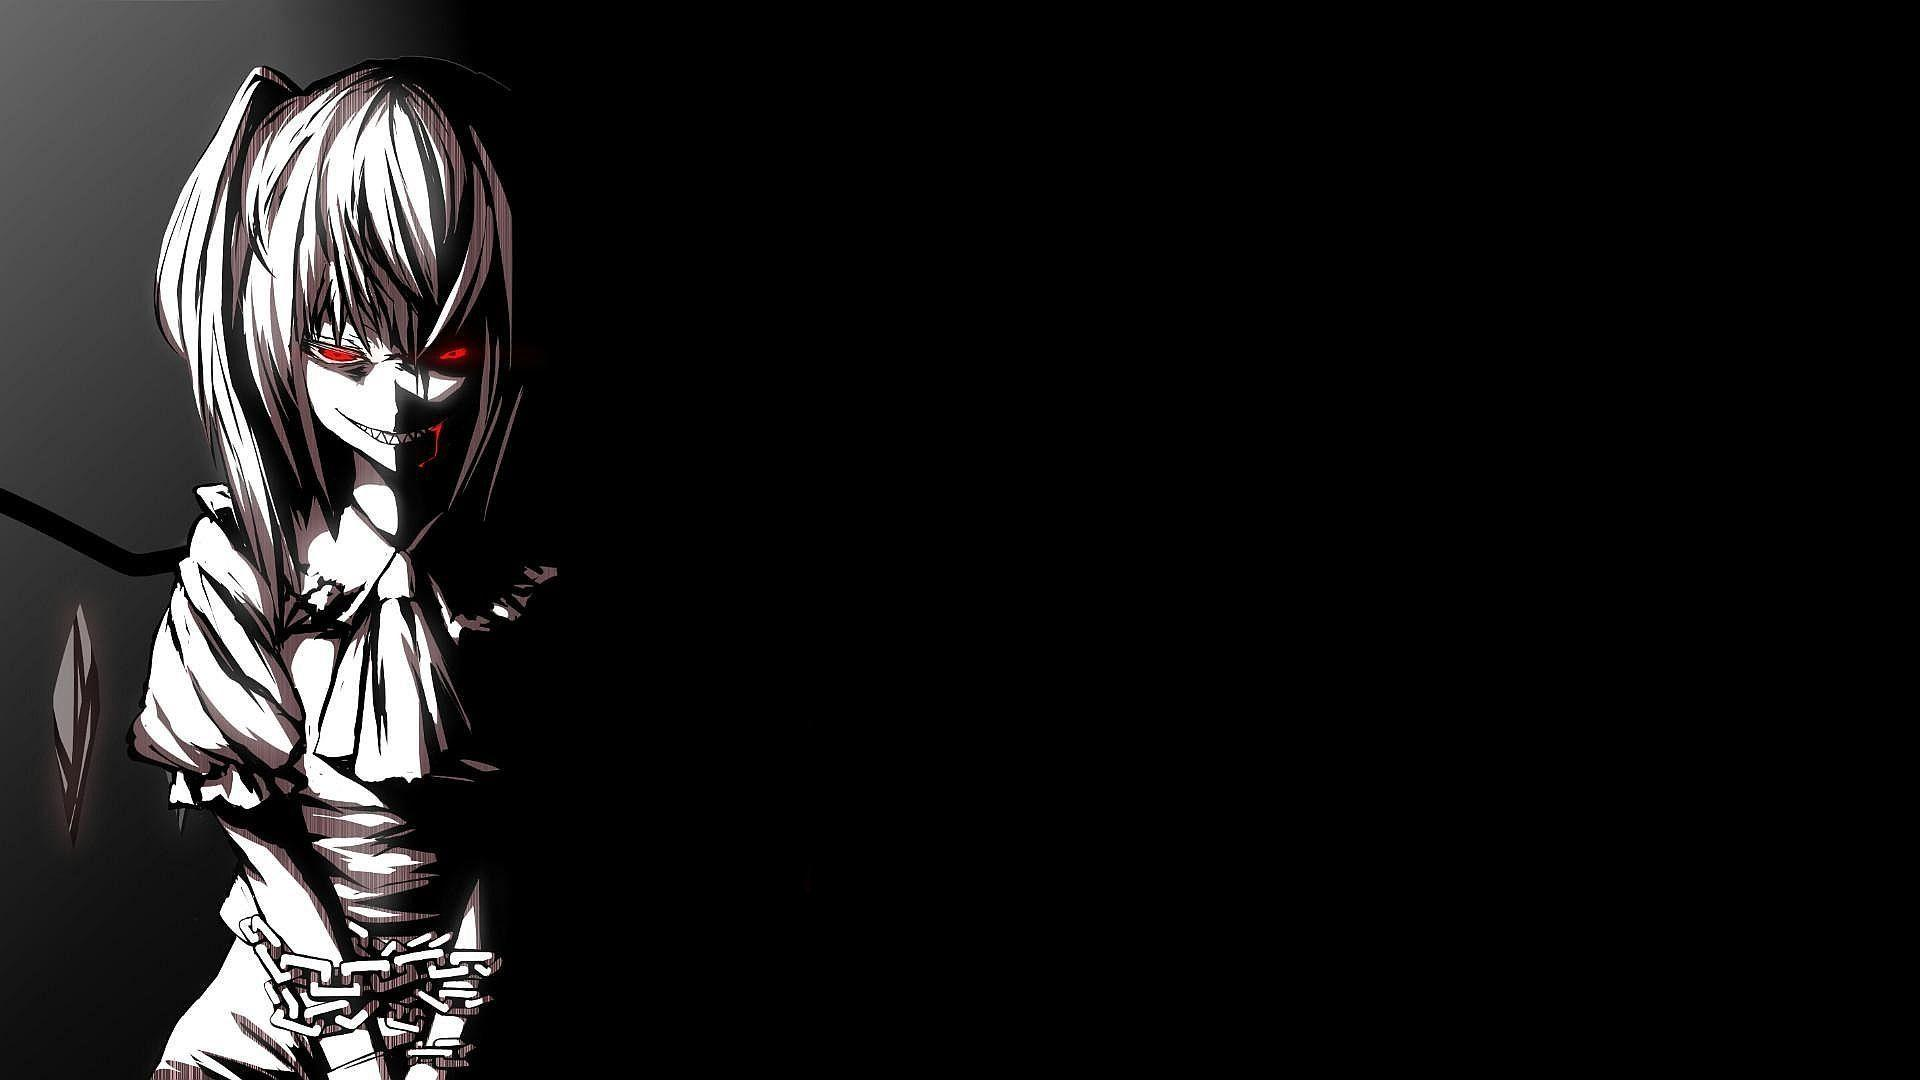 Evil Anime Face 4k Wallpapers Wallpaper Cave